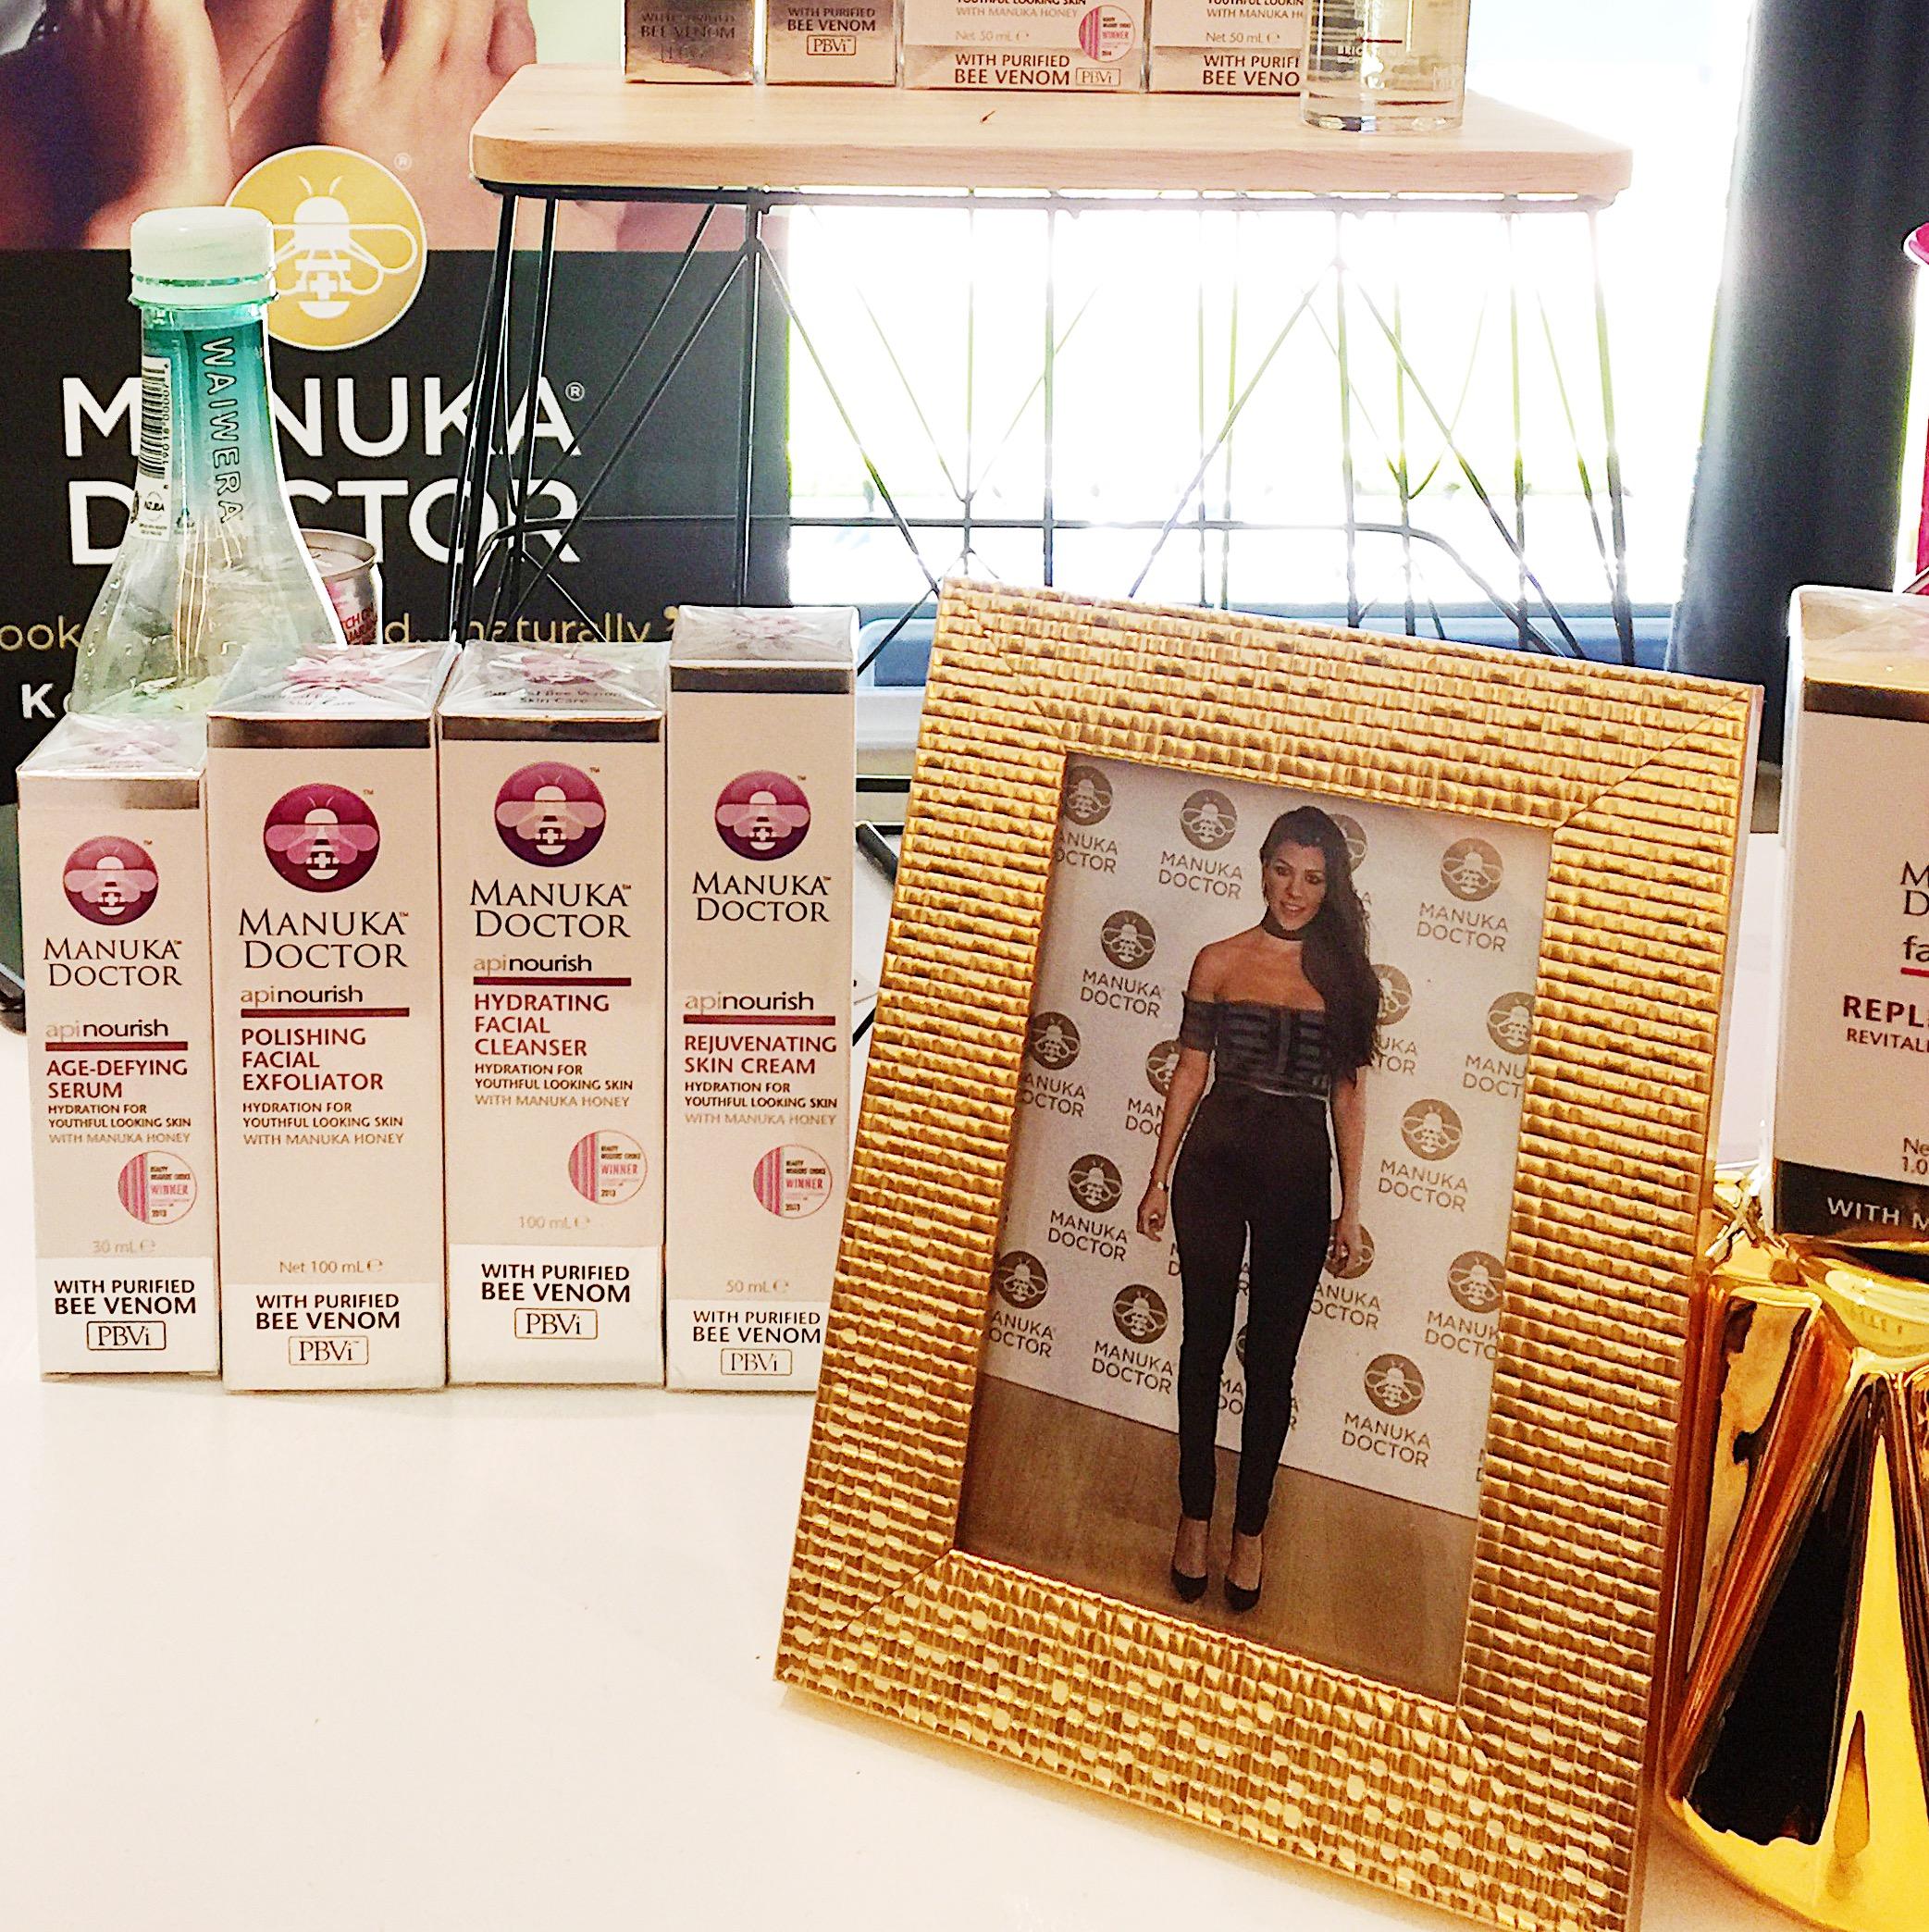 Marisa Robinson Beauty Blogger Priceline: The Beauty Prescription Event 2017 Manuka Doctor